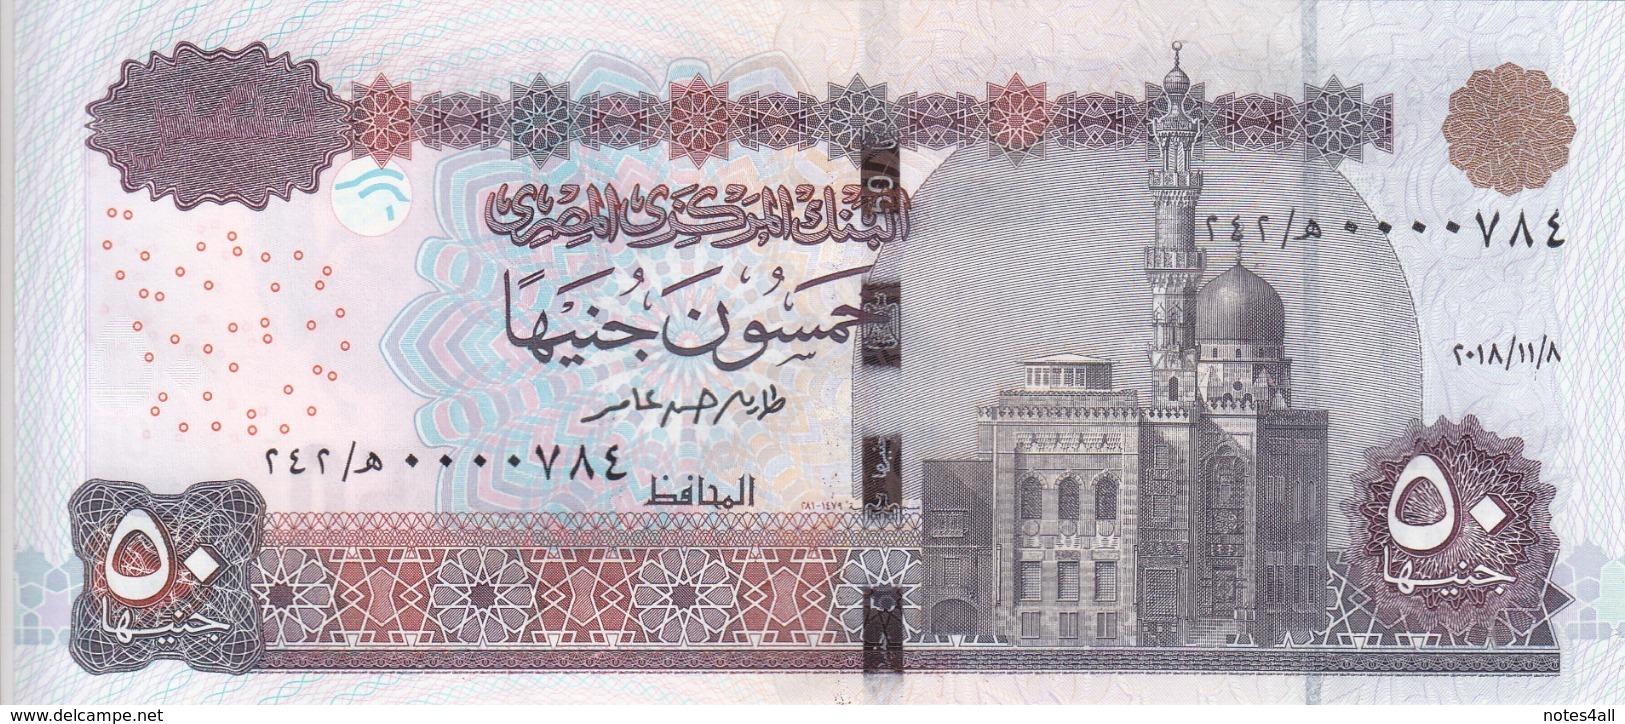 EGYPT 50 POUNDS EGP 2018 P-66 New SIG/T.A 24 LOW SERIAL 0000XXX LOT X5 UNC NOTES - Egypt